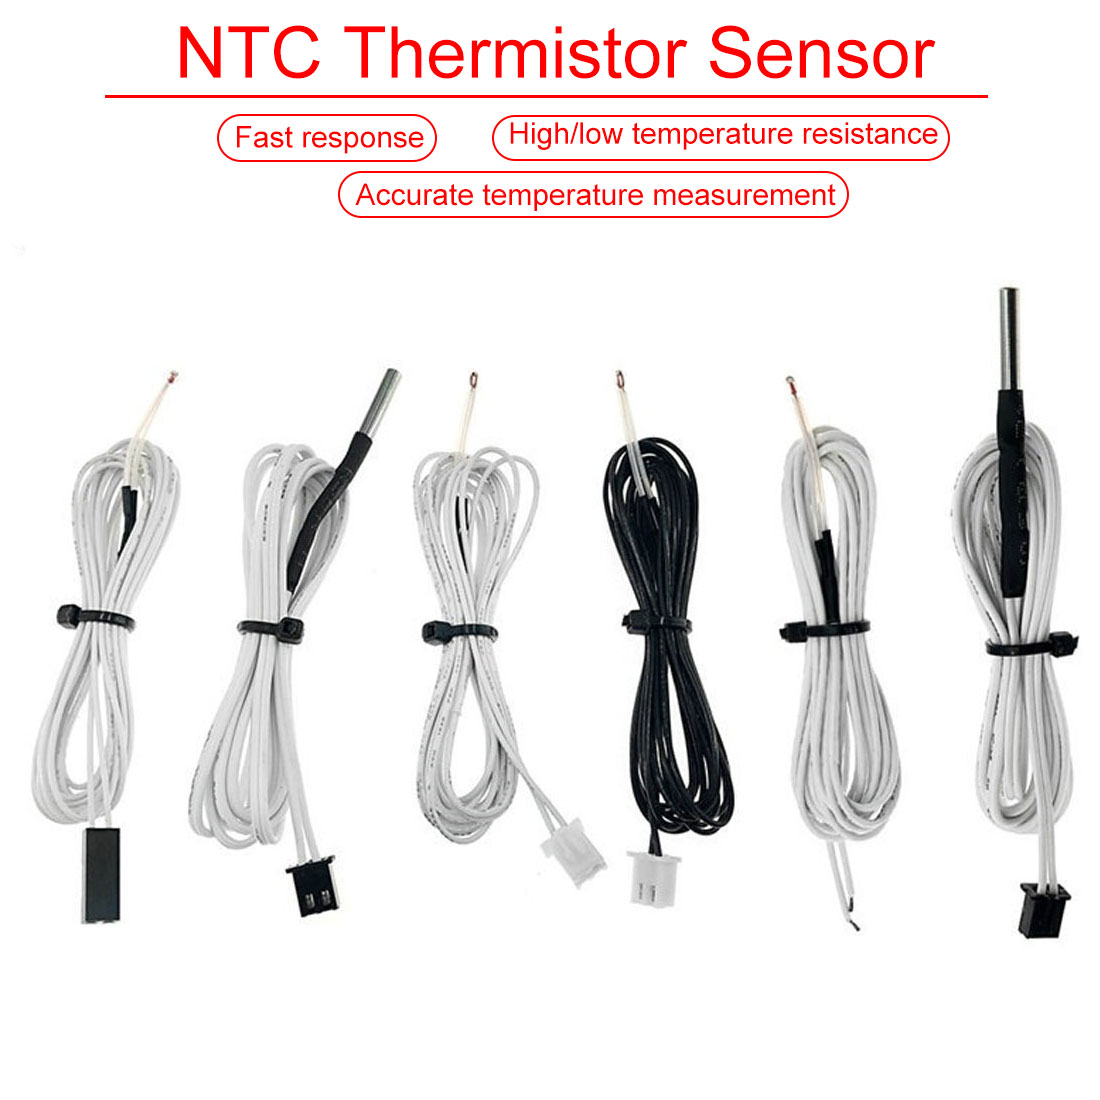 Etmakit 1M/2M HT-NTC100K Thermistor Temperature Sensor For 3D Printer Parts For High Temperature Filament 350 Degrees Hotend Kit